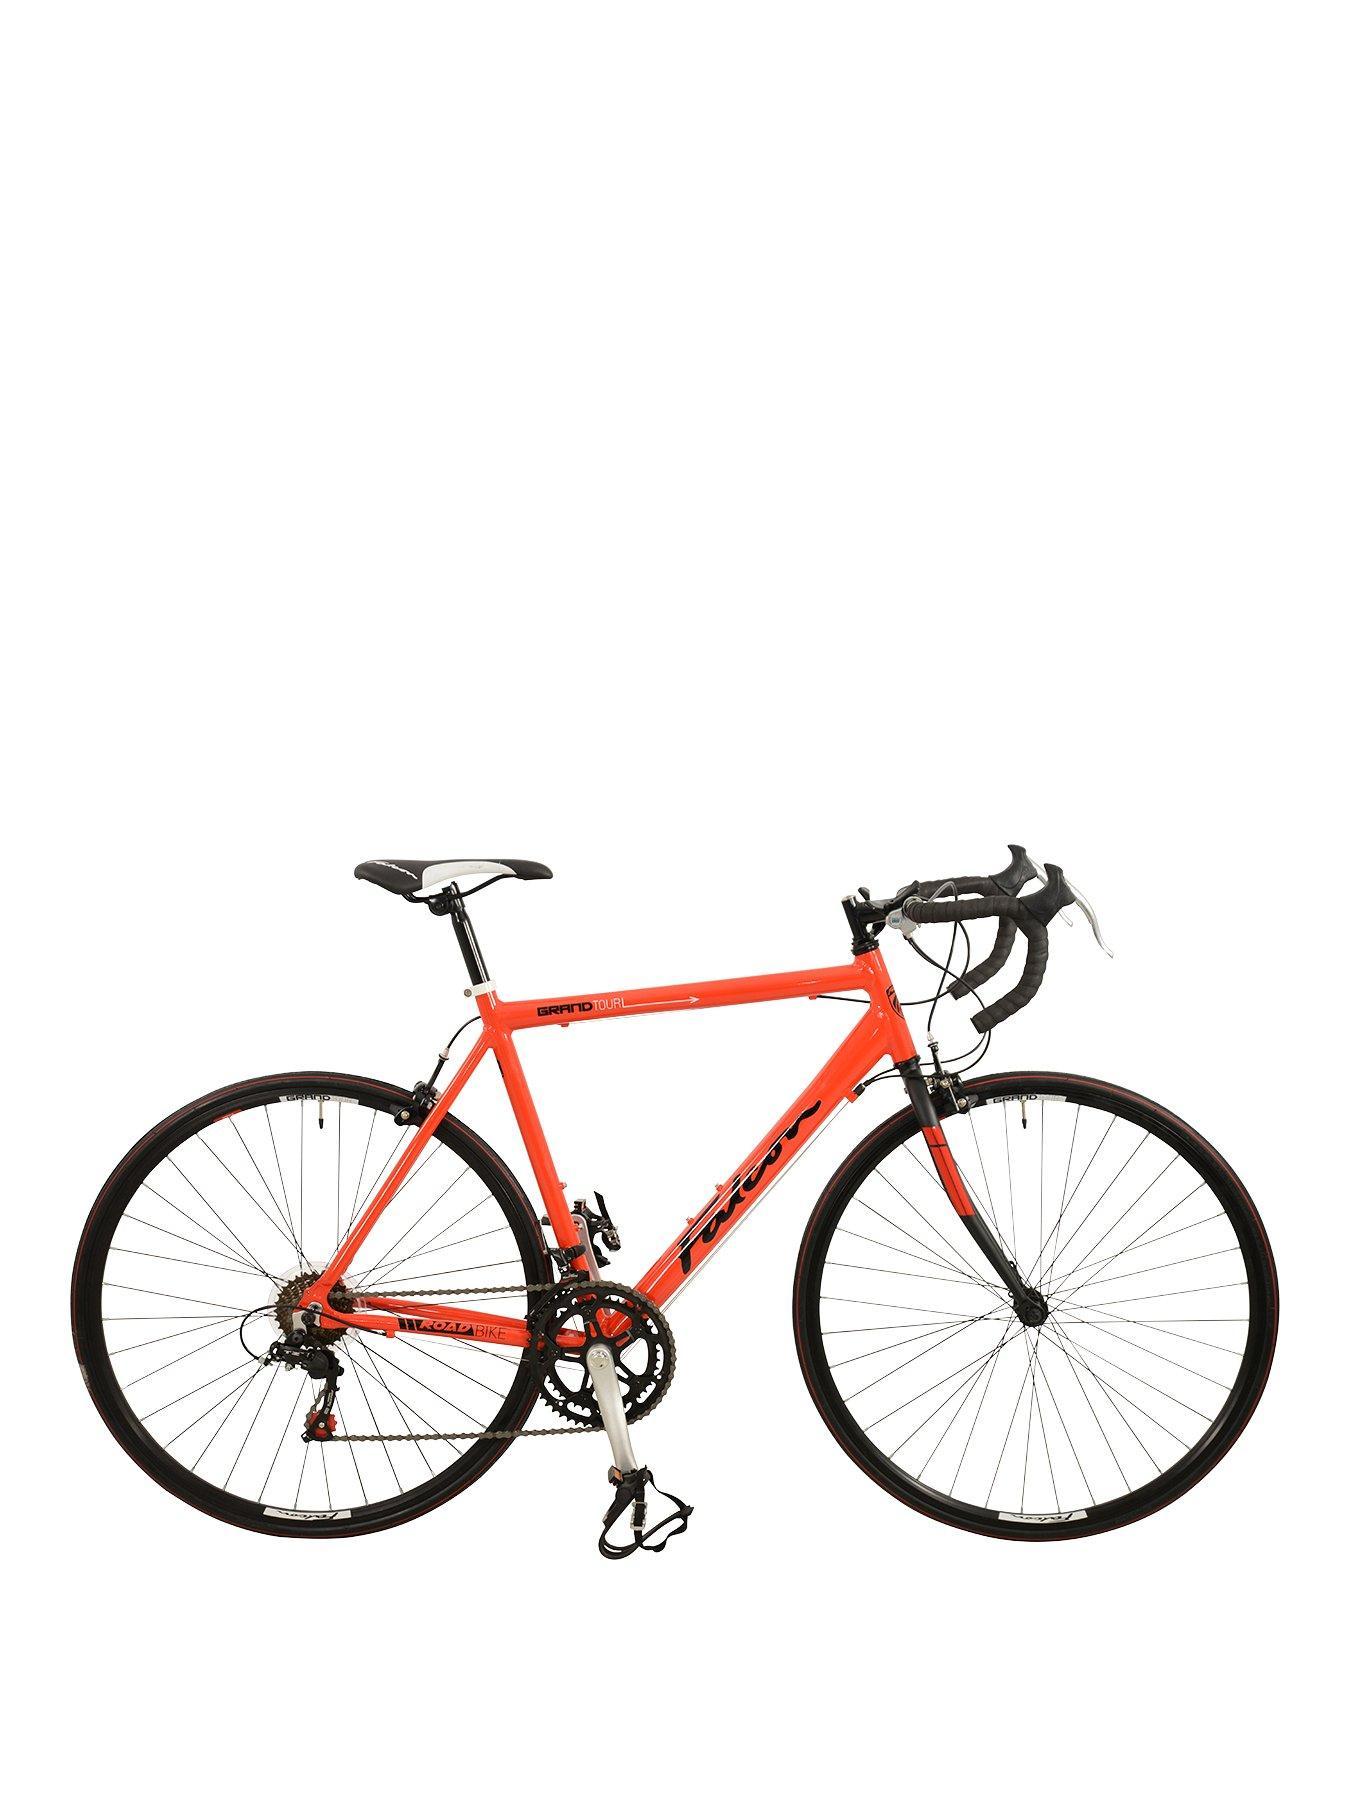 "Front Suspension Bicycle FALCON in ORANGE Teenager Boys 24/"" Raptor KIDS BIKE"